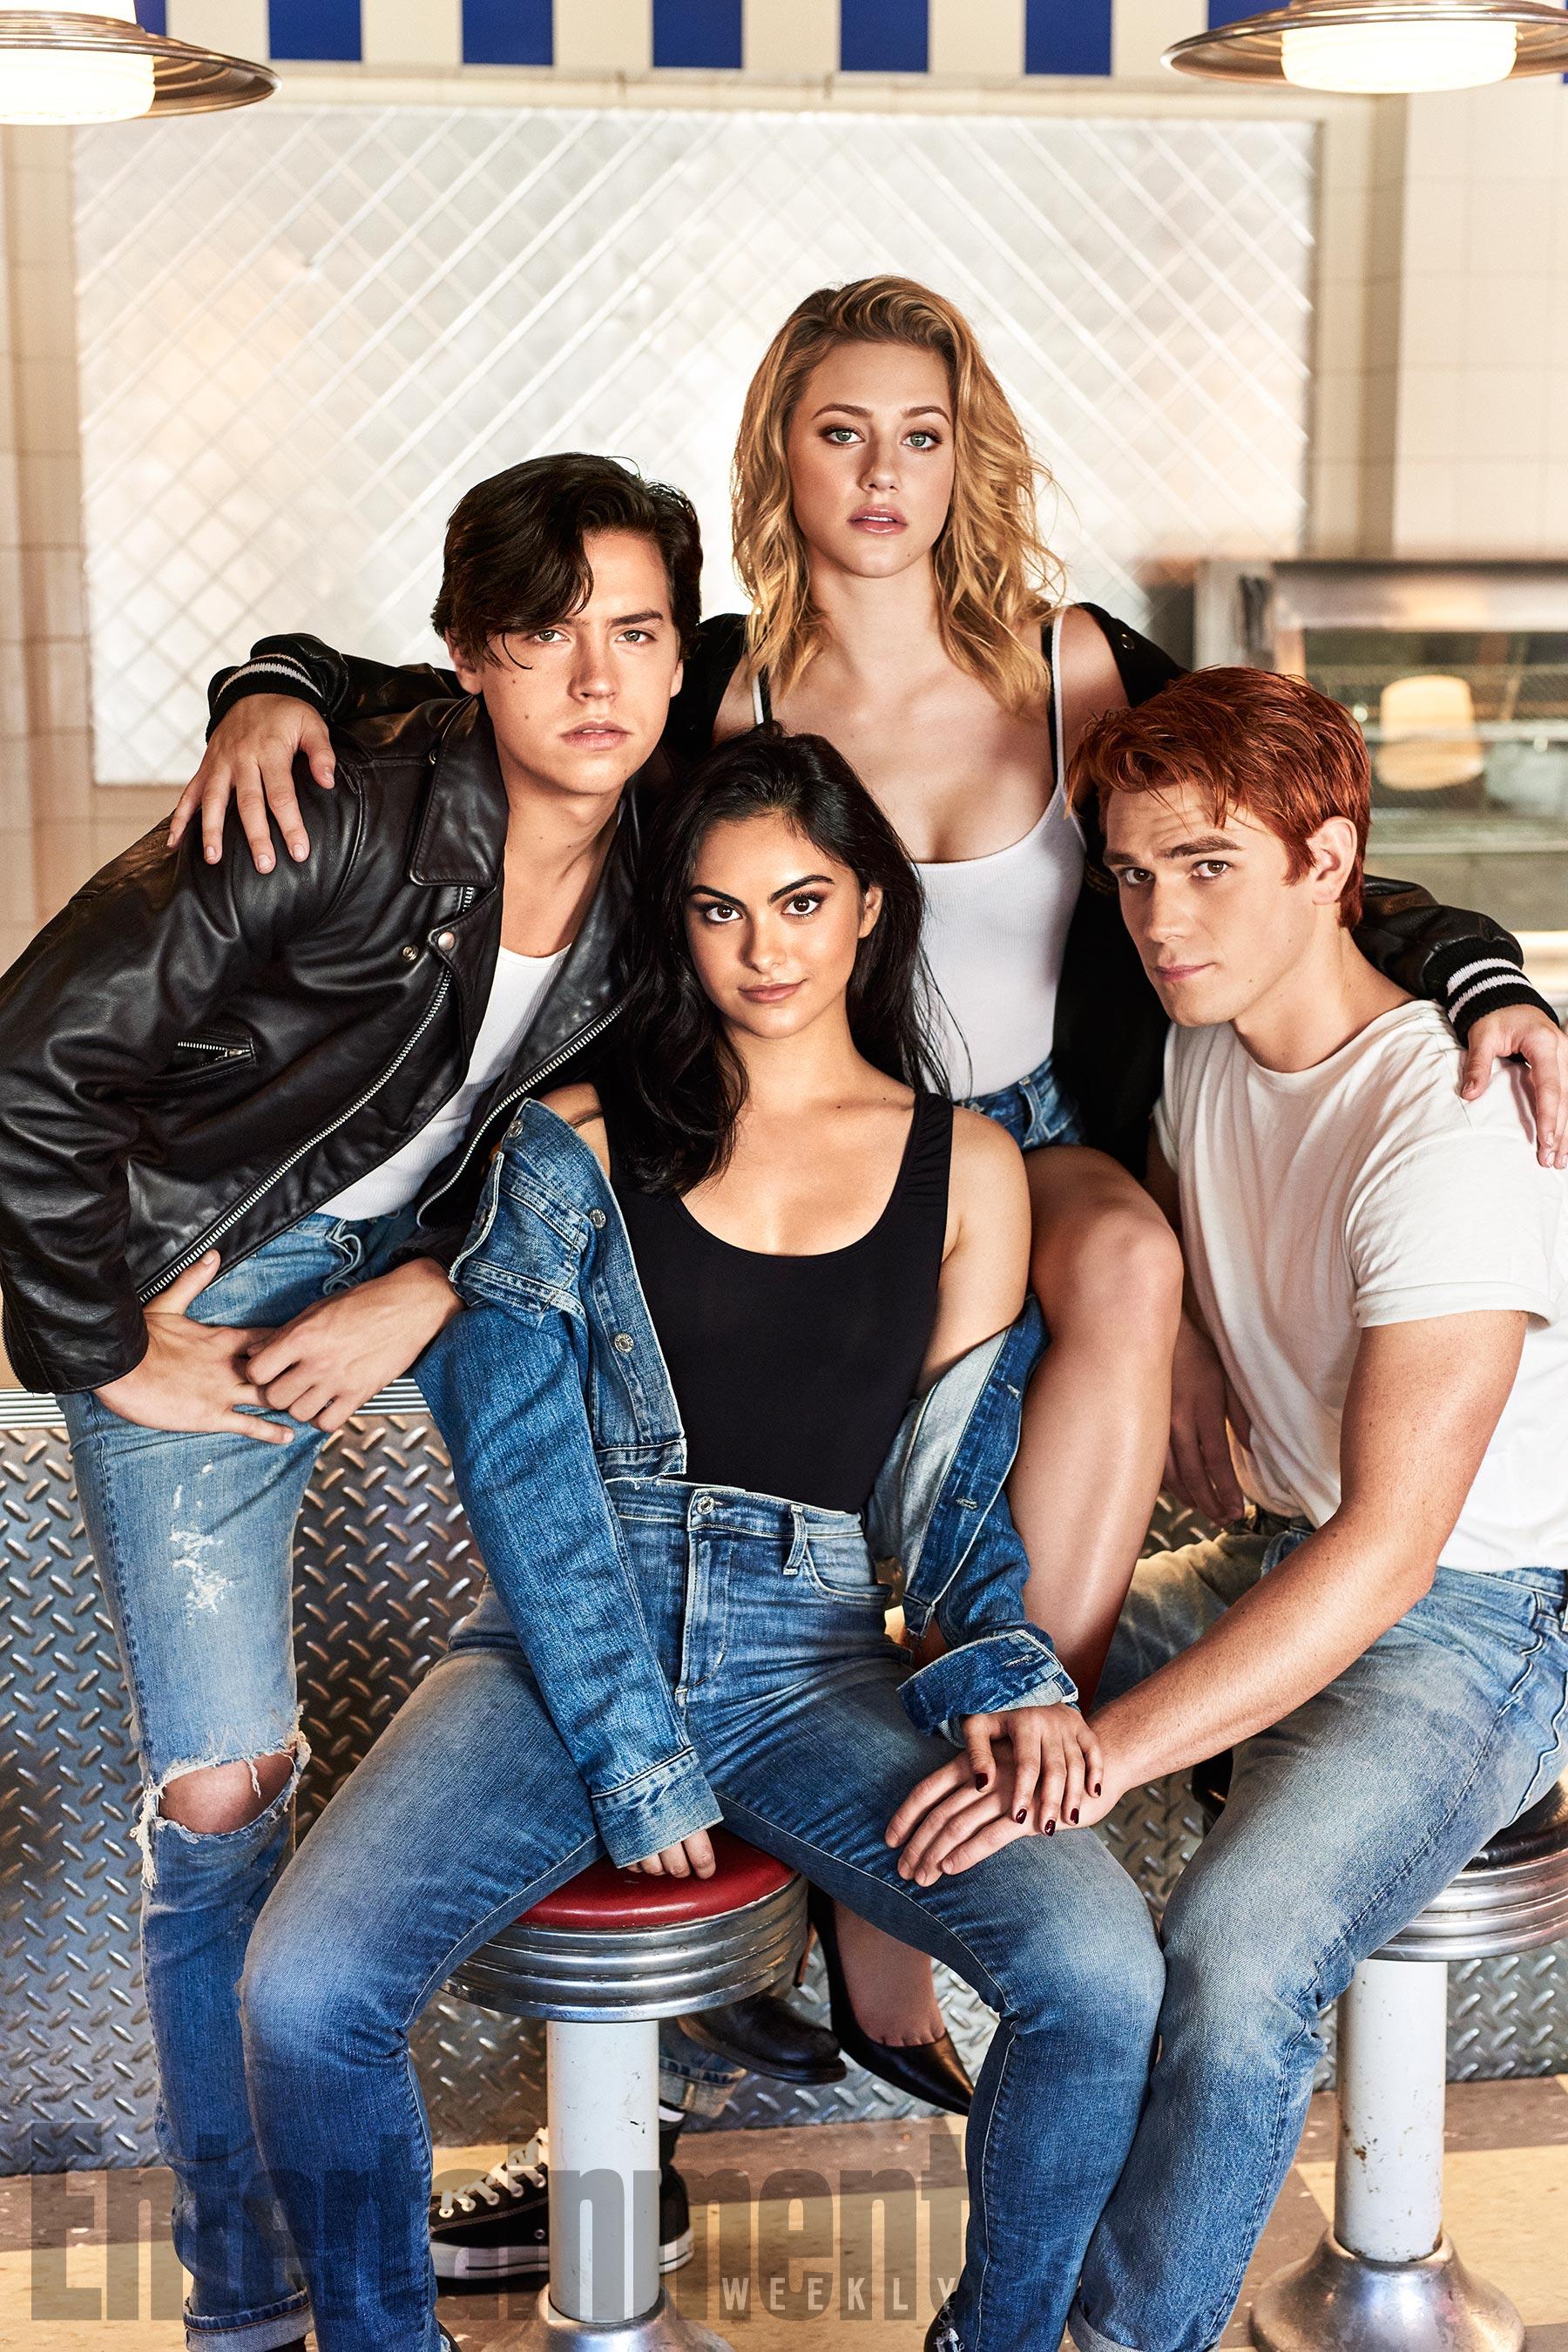 Cole Sprouse (Jughead Jones), Camila Mendes (Veronica Lodge), Lili Reinhart (Betty Cooper) és KJ Apa (Archie Andrews)